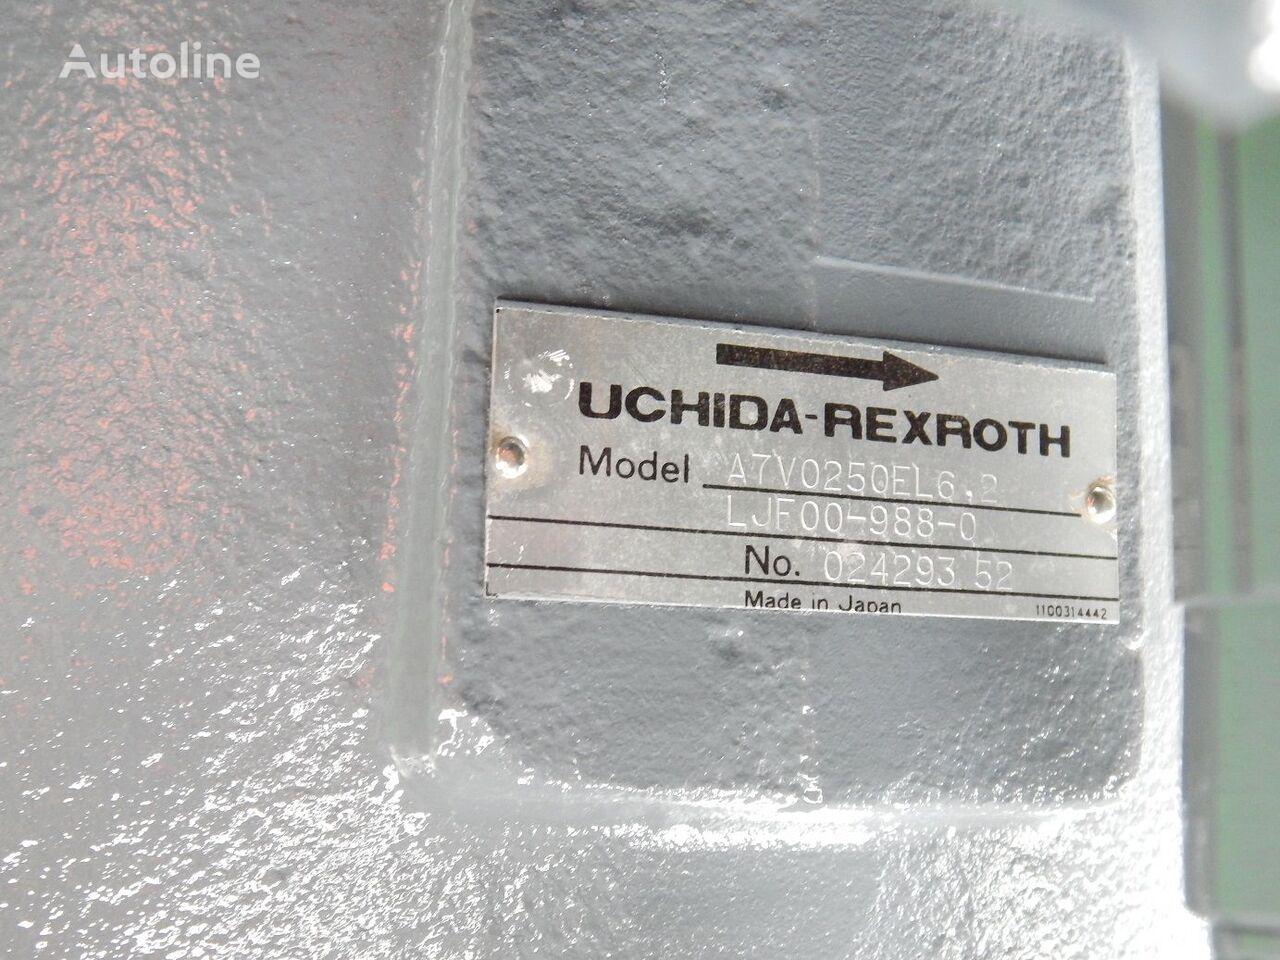 hidraulična pumpa FIAT-HITACHI UCHIDA REXROTH A7V0250EL6. 2 UCHIDA REXROTH za bagera FIAT-HITACHI EX455